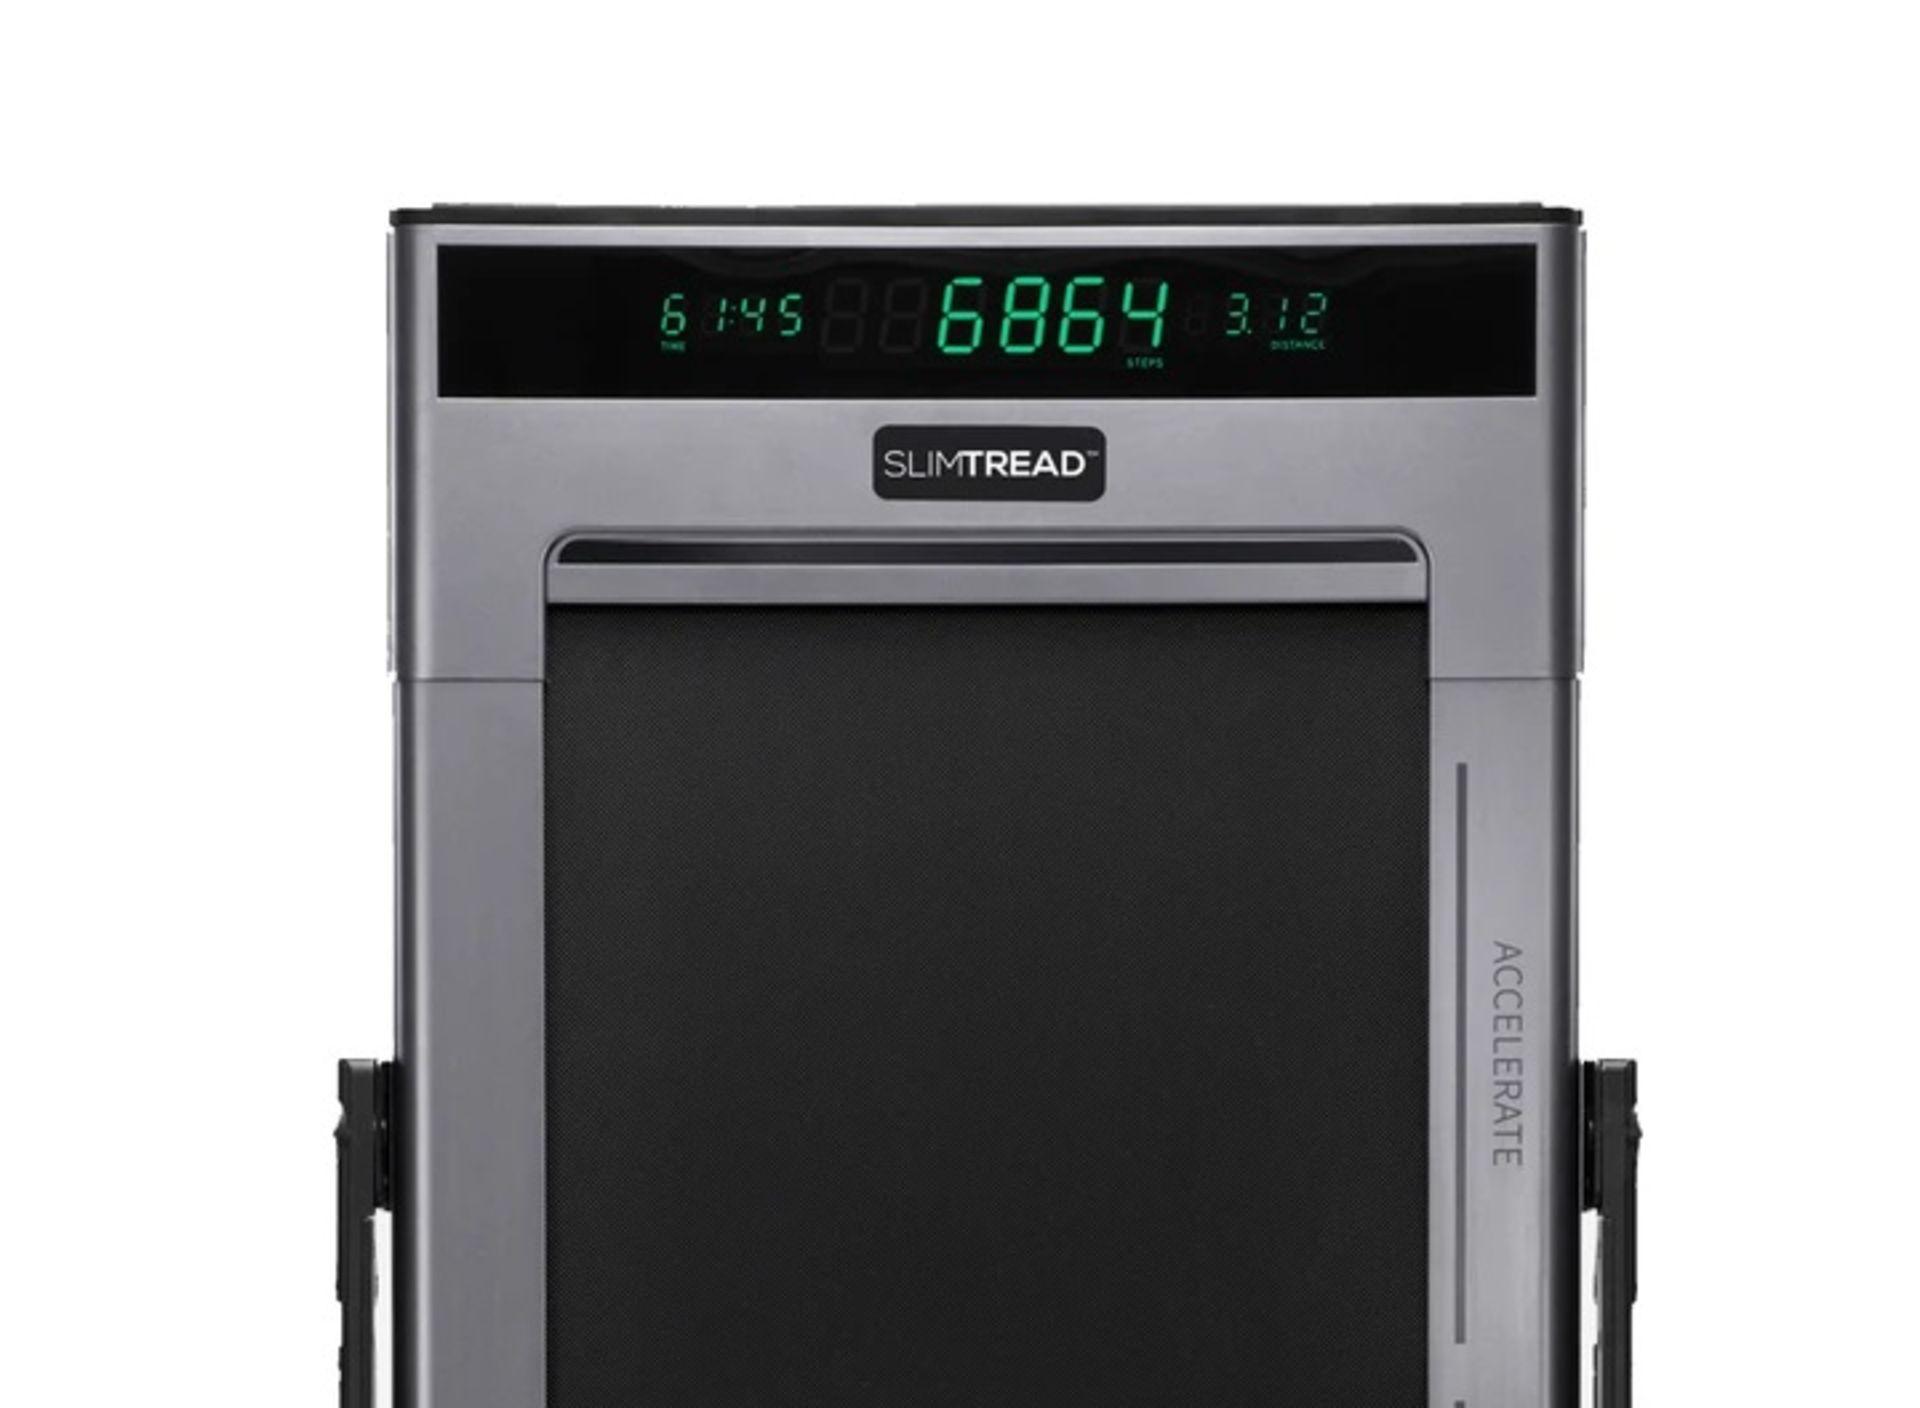 1 x Slim Tread Ultra Thin Smart Treadmill Running / Walking Machine - Lightweight With Folding - Image 23 of 23